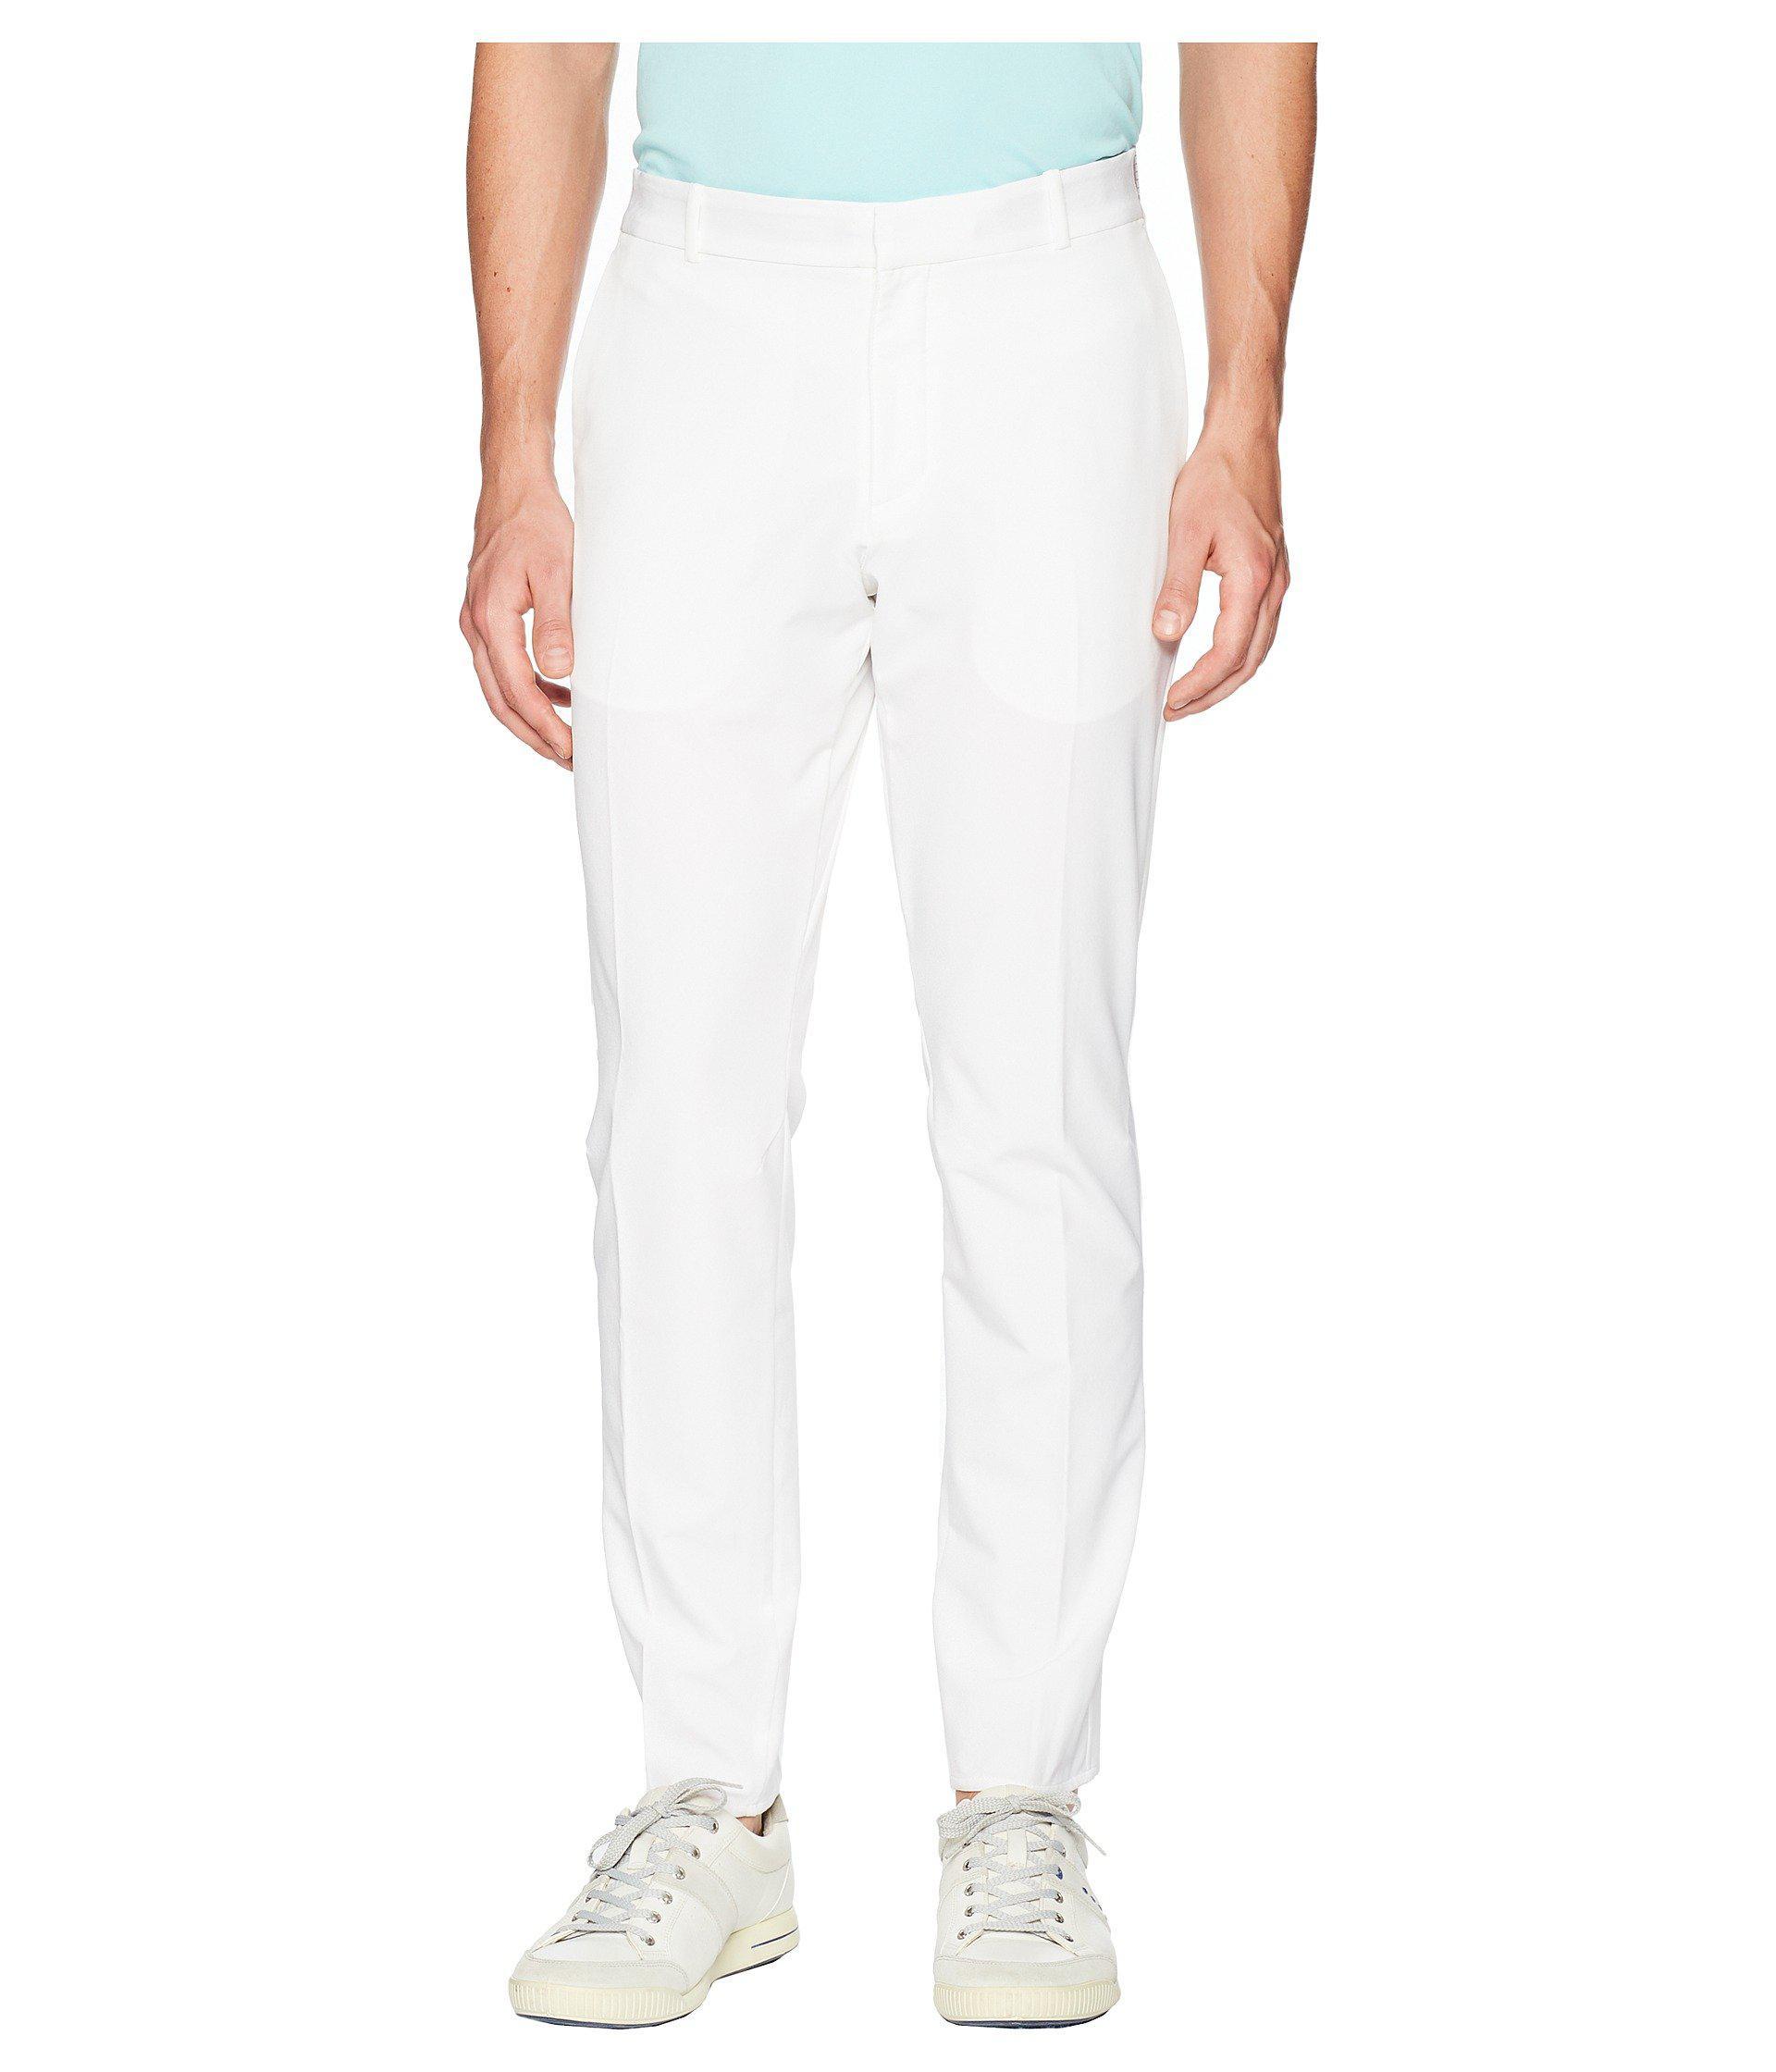 897b31f5787b Lyst - Nike Flex Pants in White for Men - Save 22%